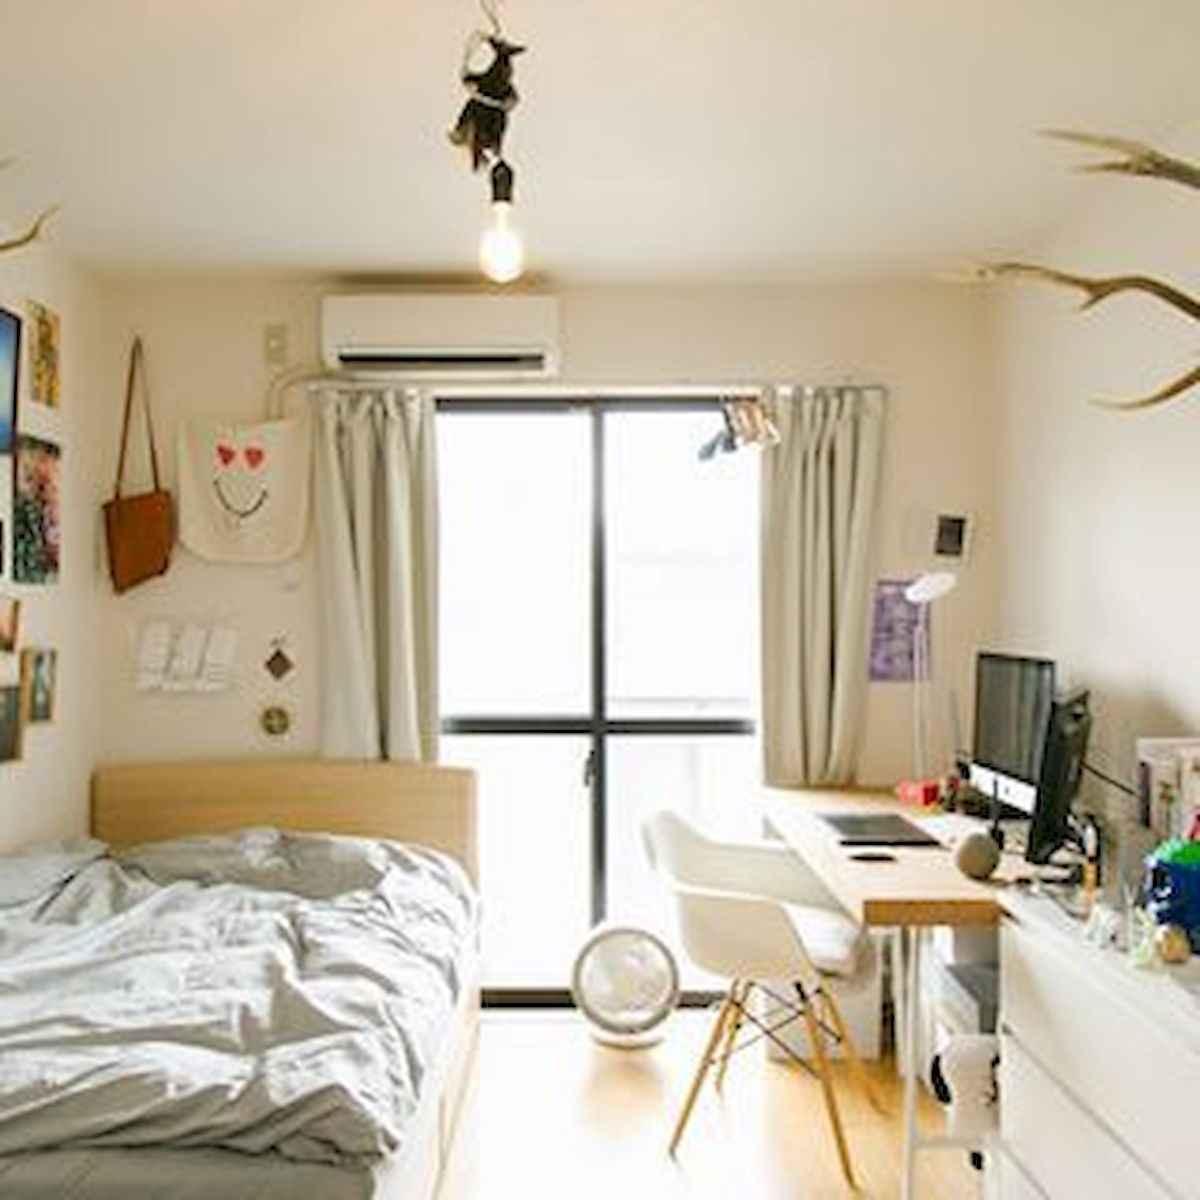 80 Fantastic Small Apartment Bedroom College Design Ideas and Decor (15)